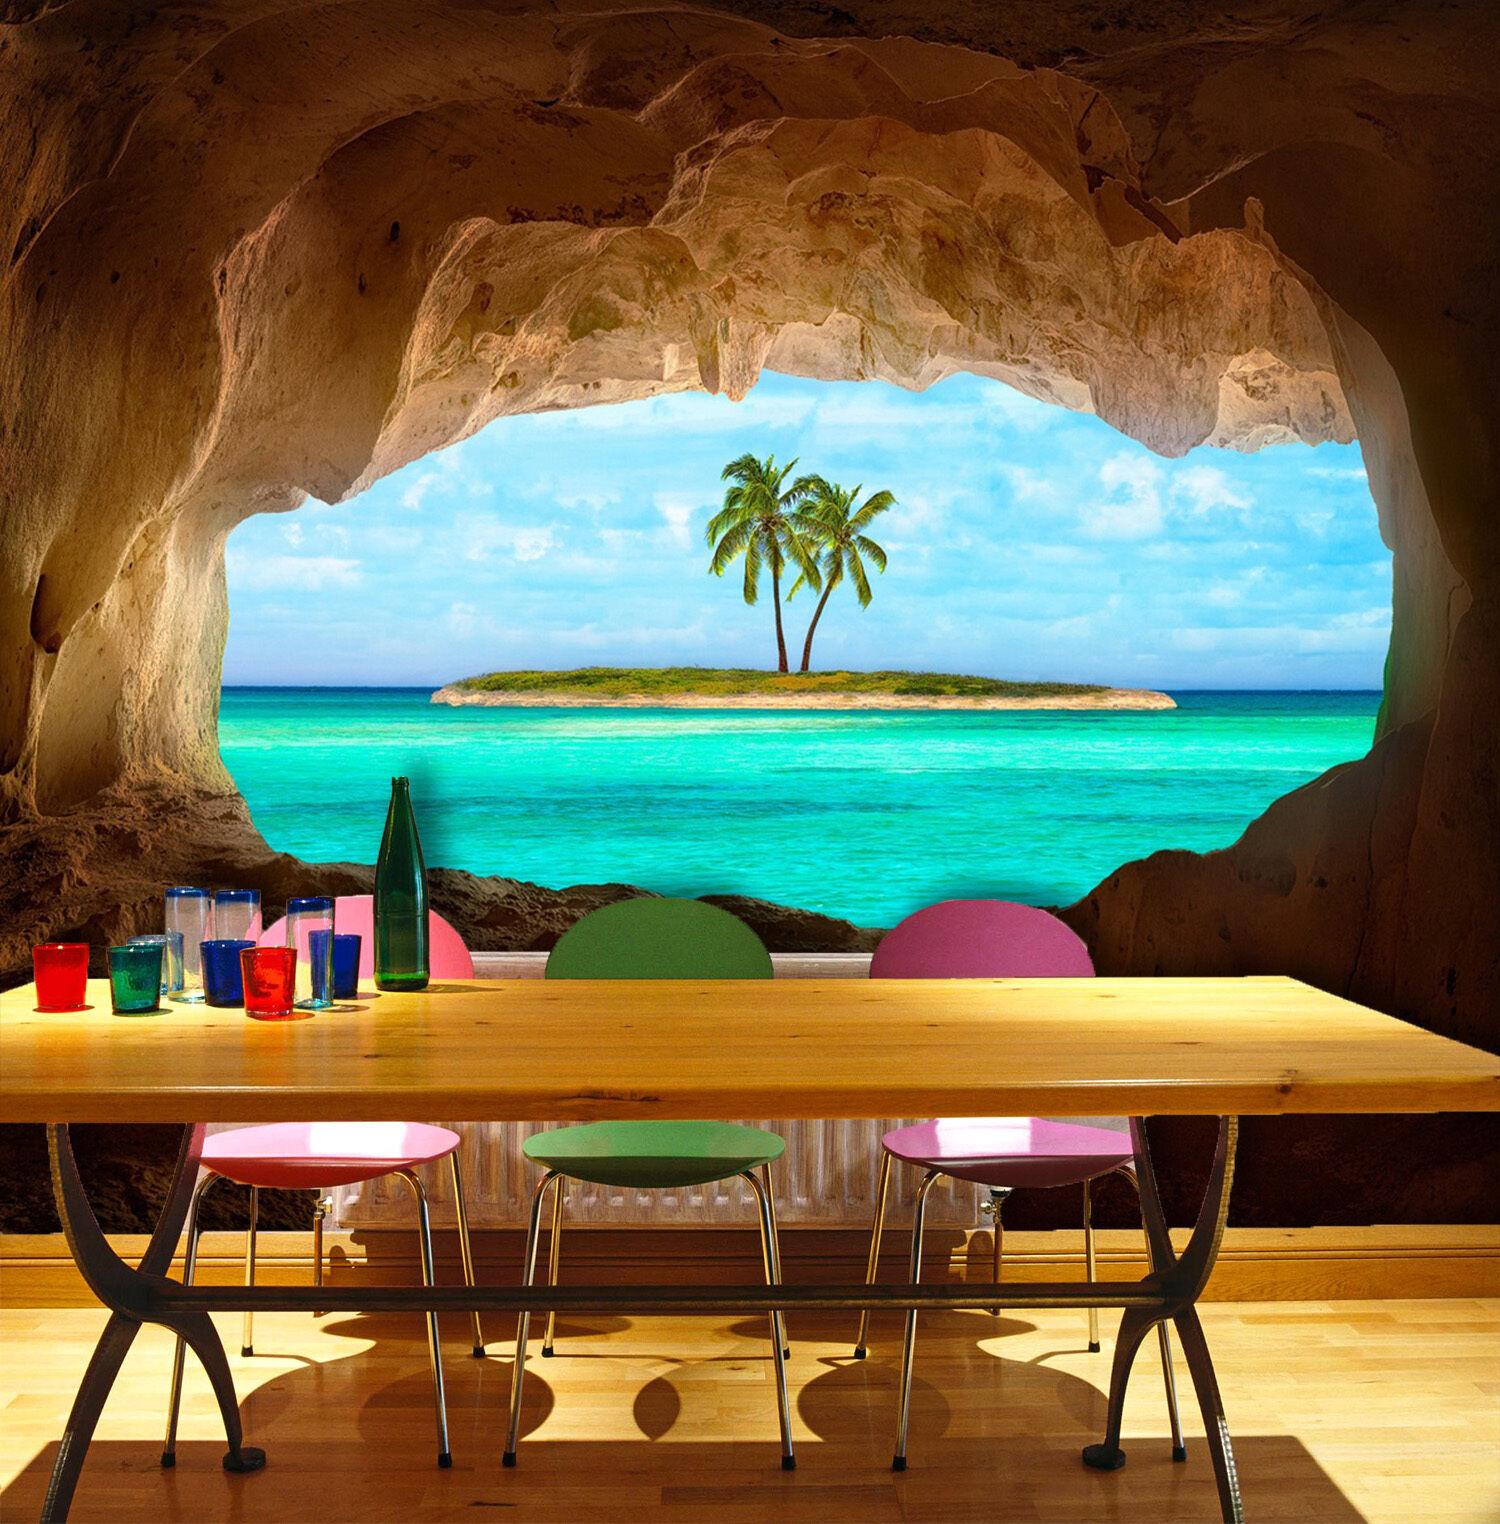 3D Cave Sea Island 1858 Wallpaper Decal Dercor Home Kids Nursery Mural Home